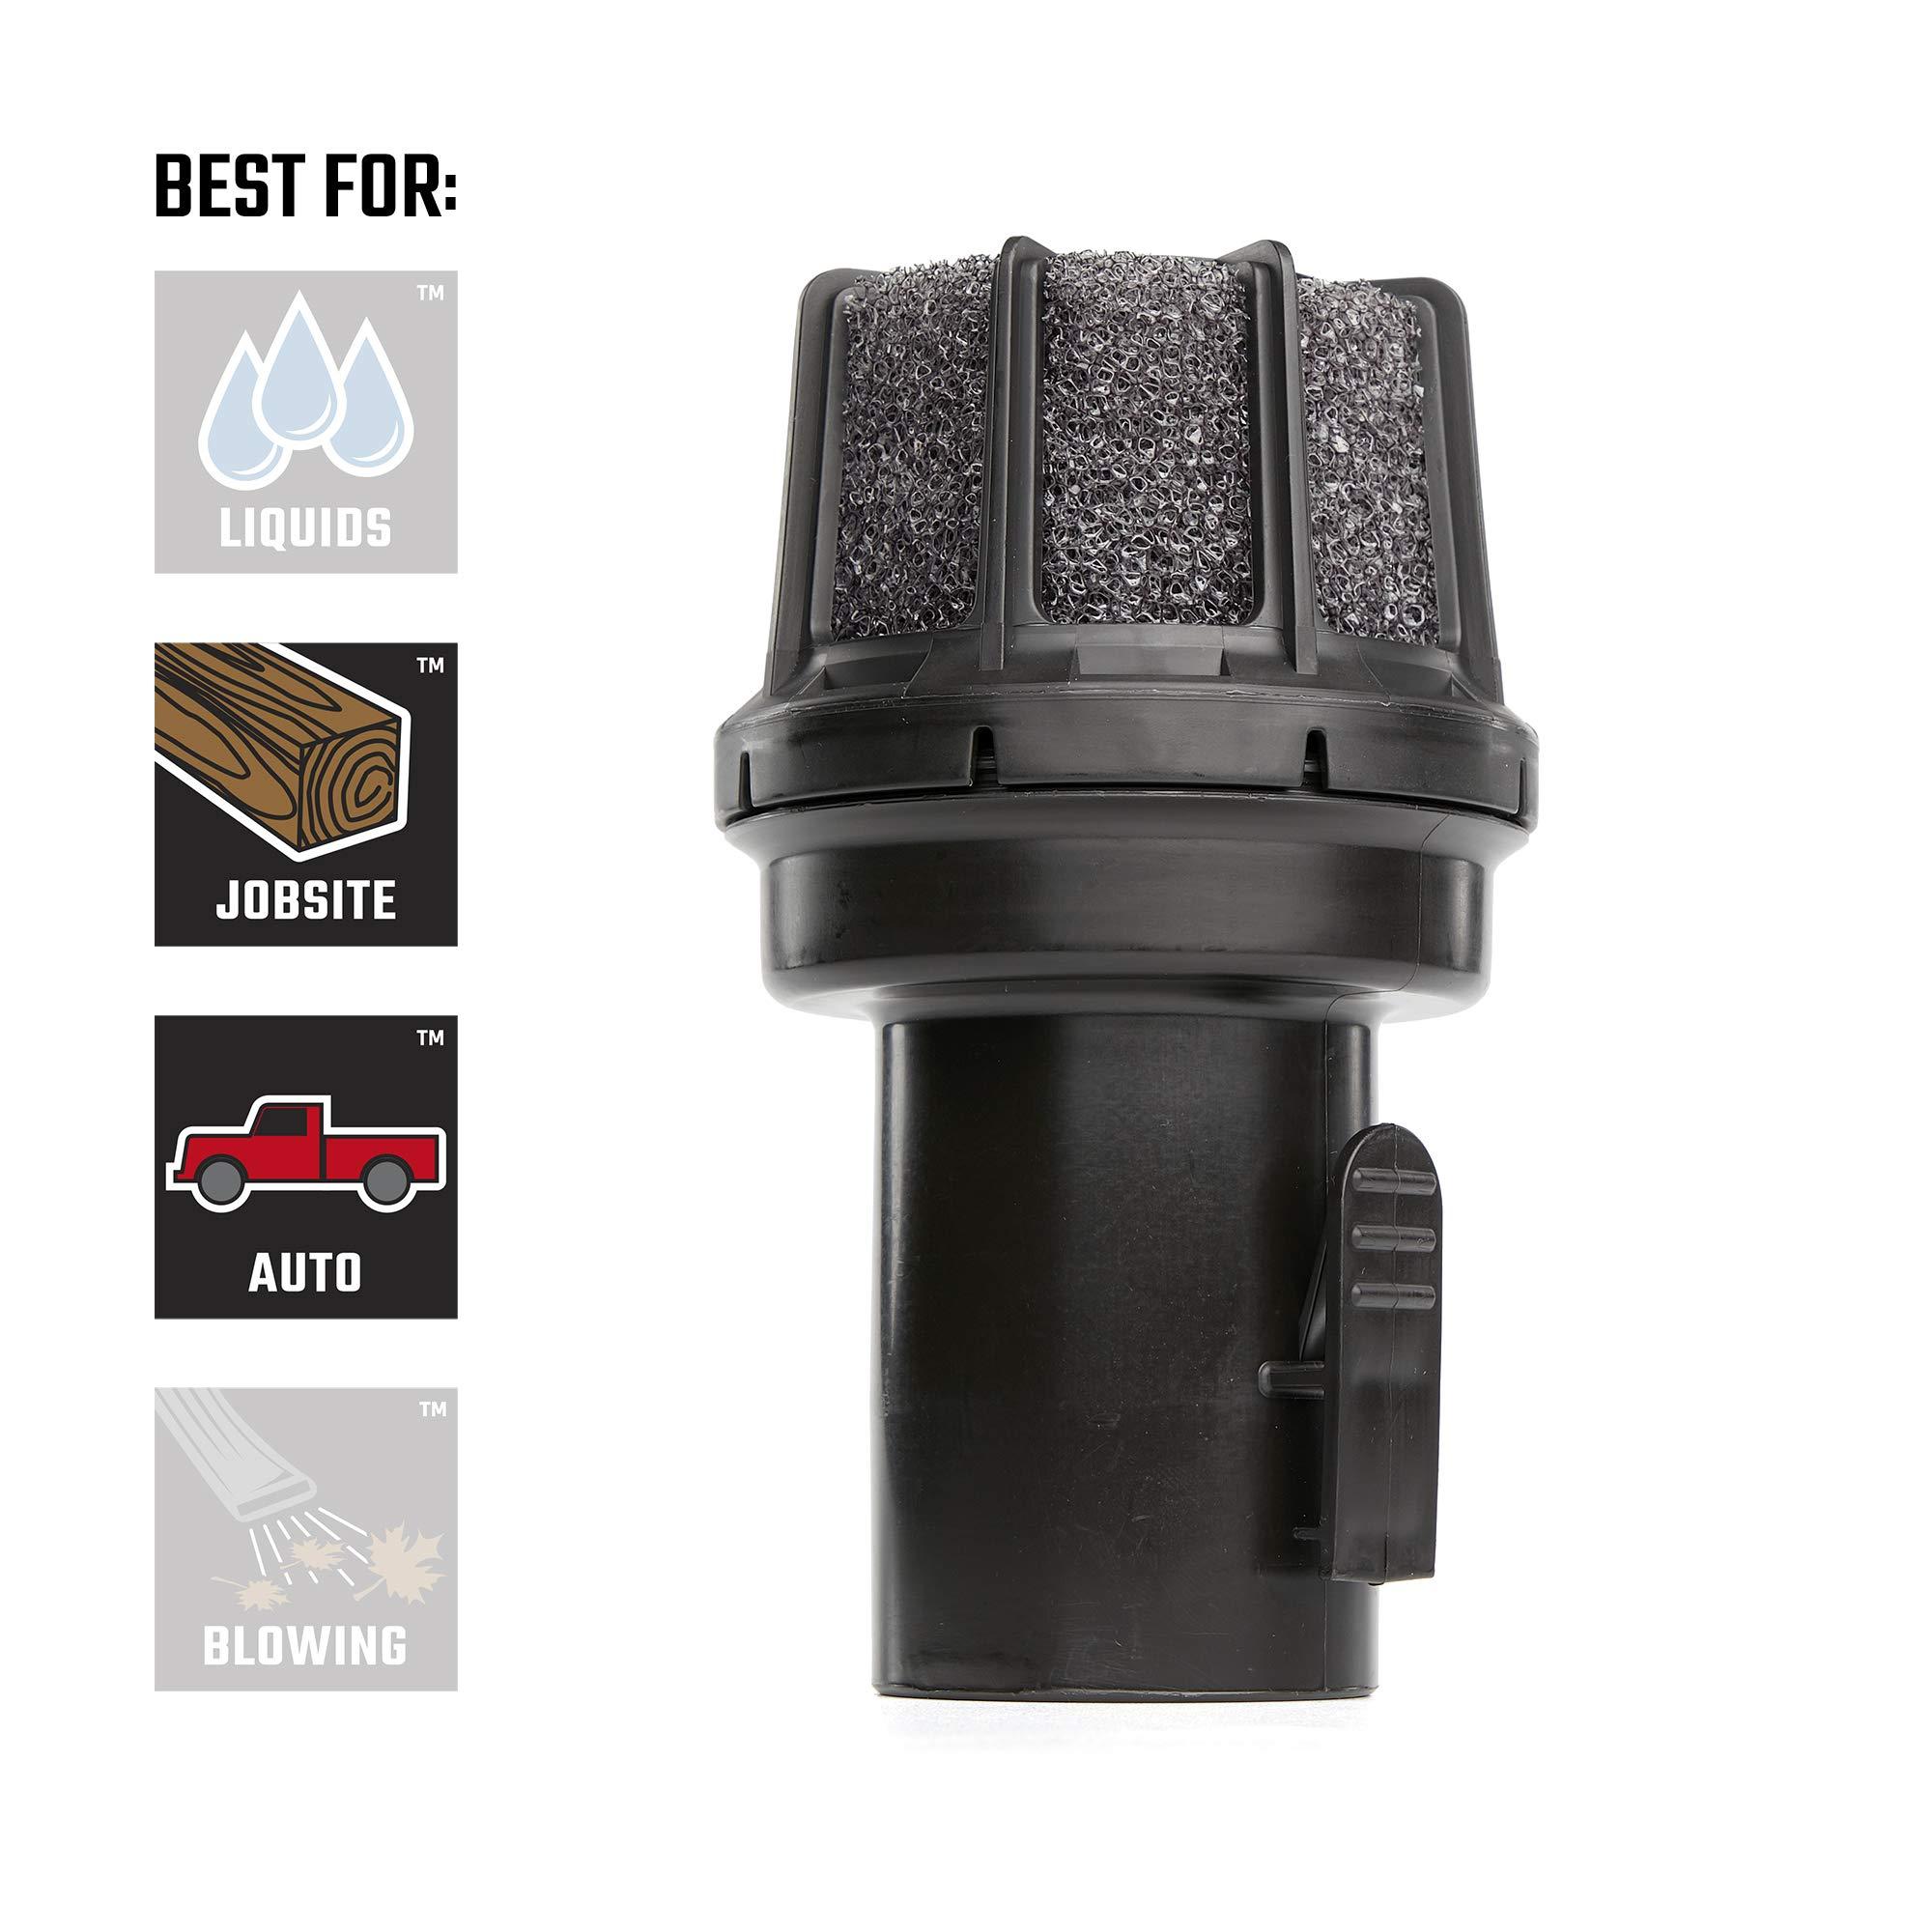 CRAFTSMAN CMXZVBE38660 2-1/2'' Muffler Diffuser Wet/Dry Vac Attachment by Craftsman (Image #2)